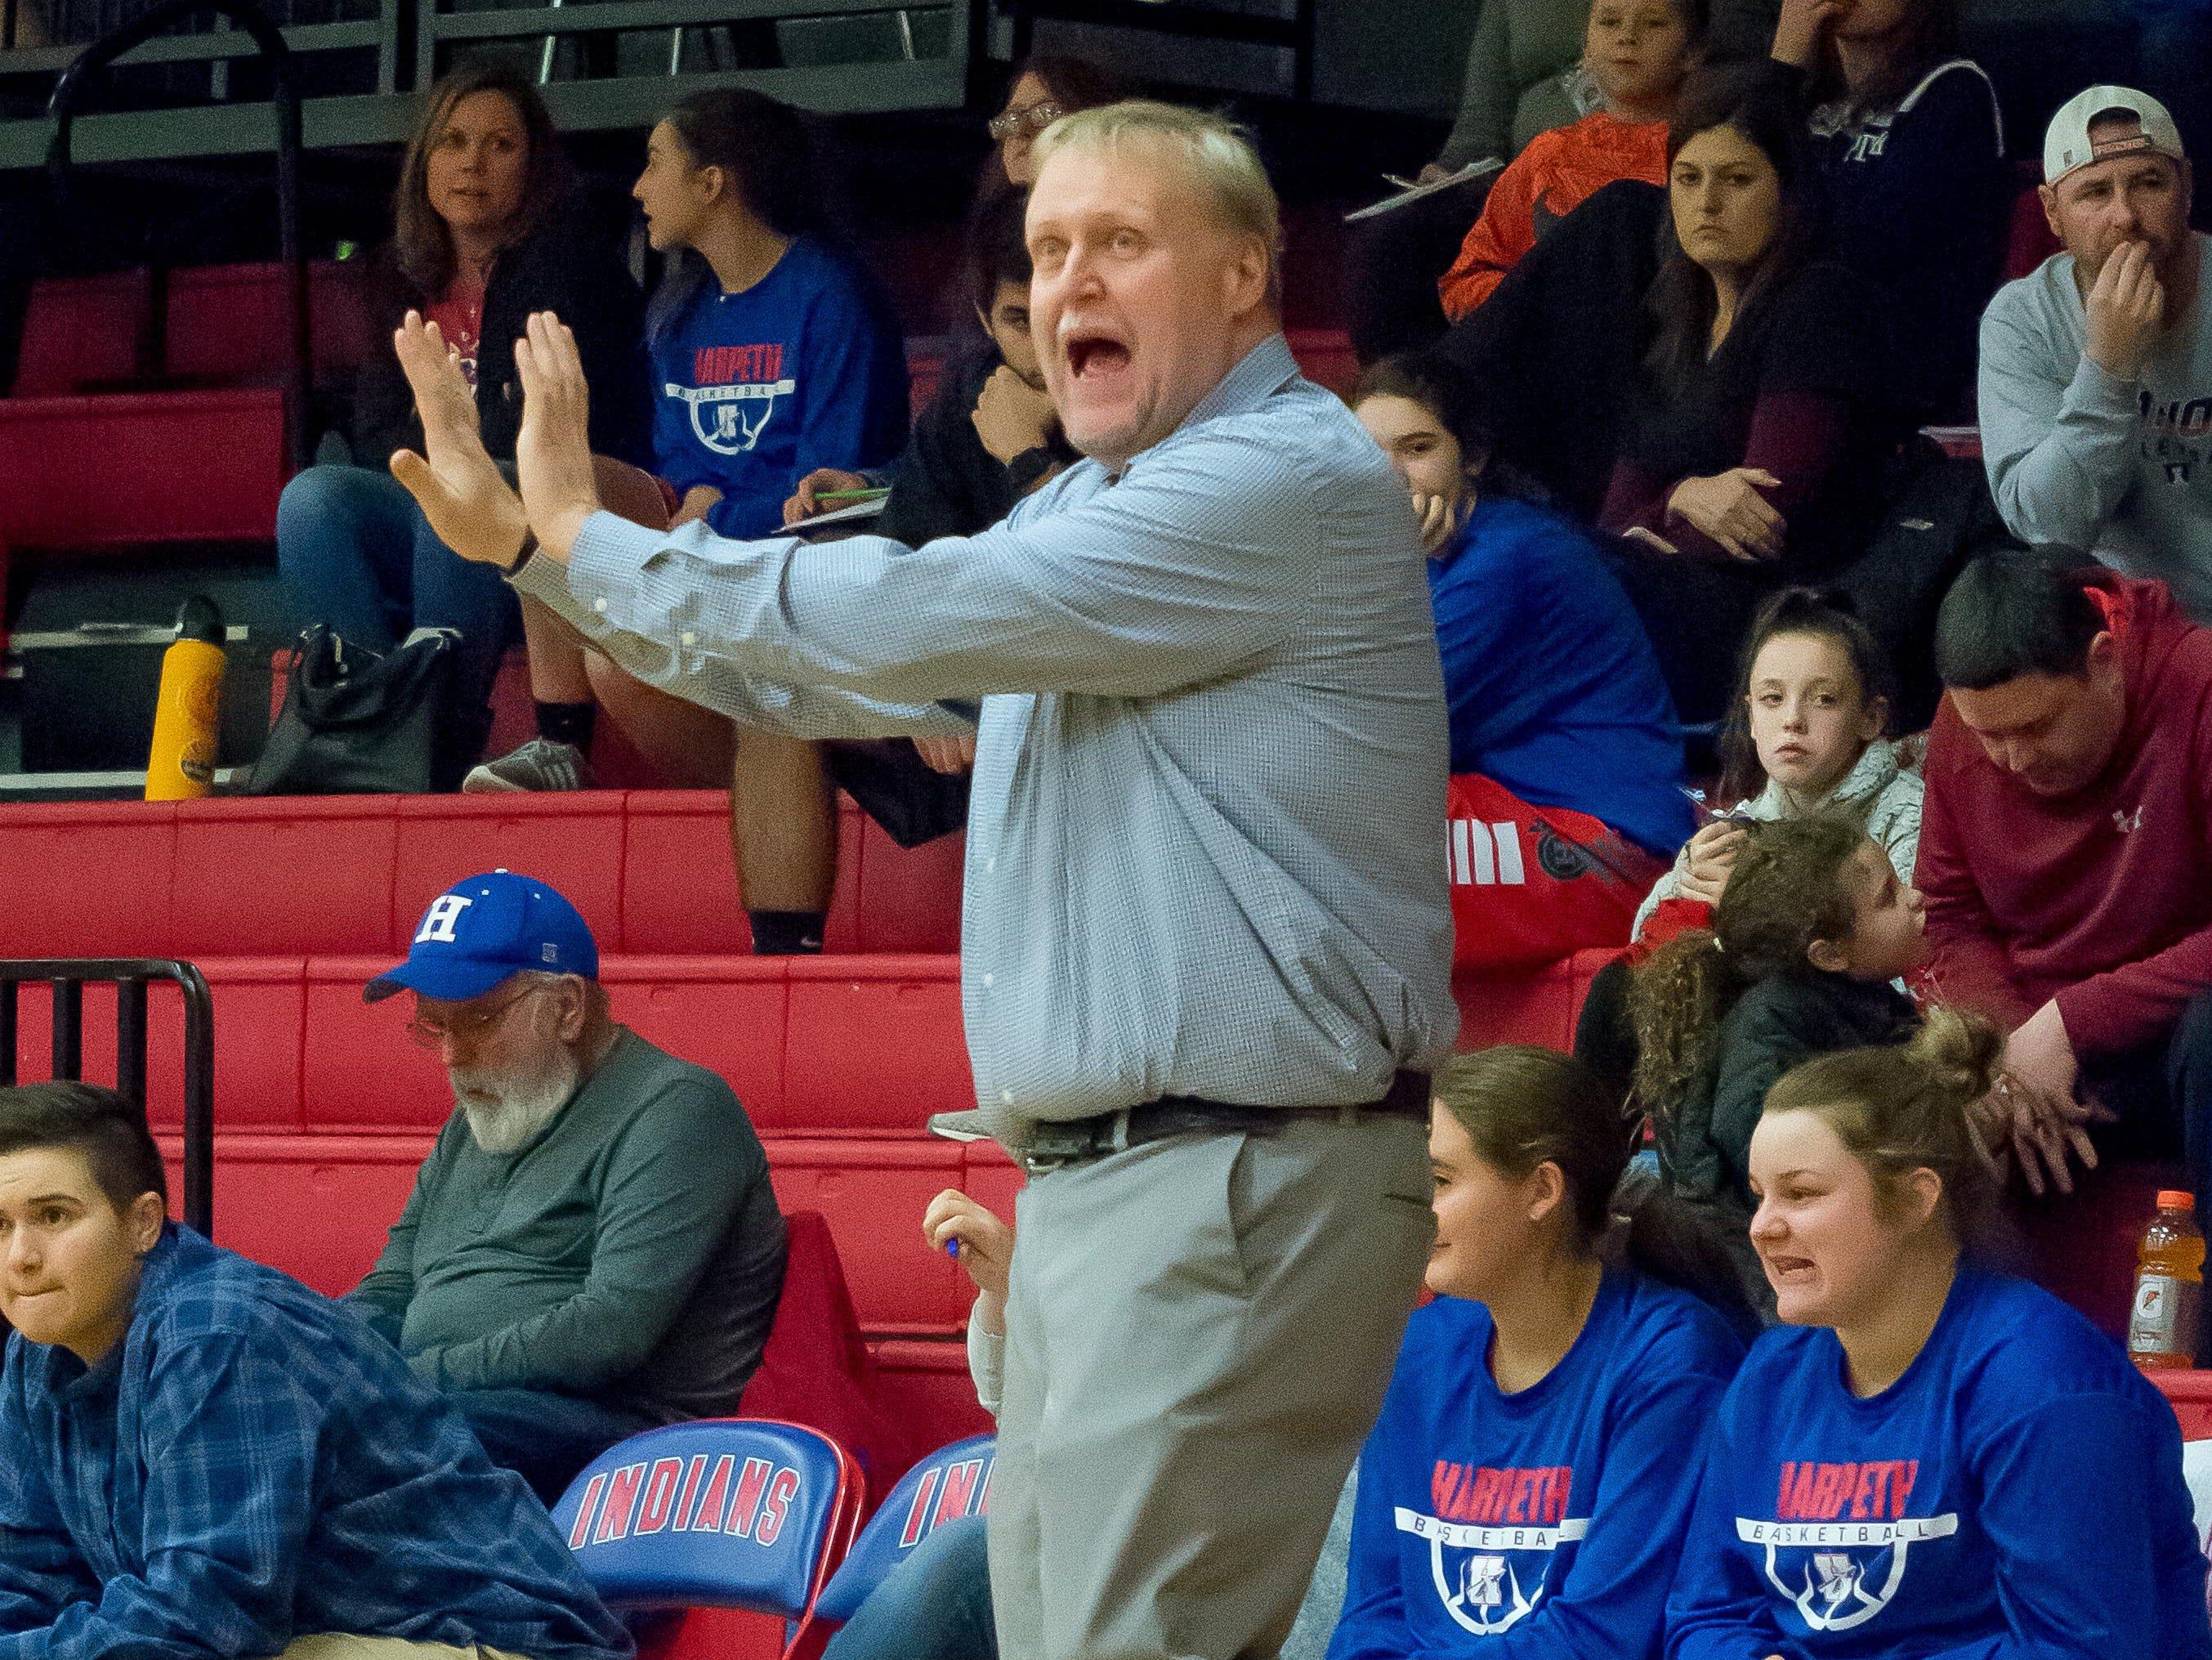 Harpeth girls basketball coach Jimmy Mitchell coaches his team against Greenbrier.